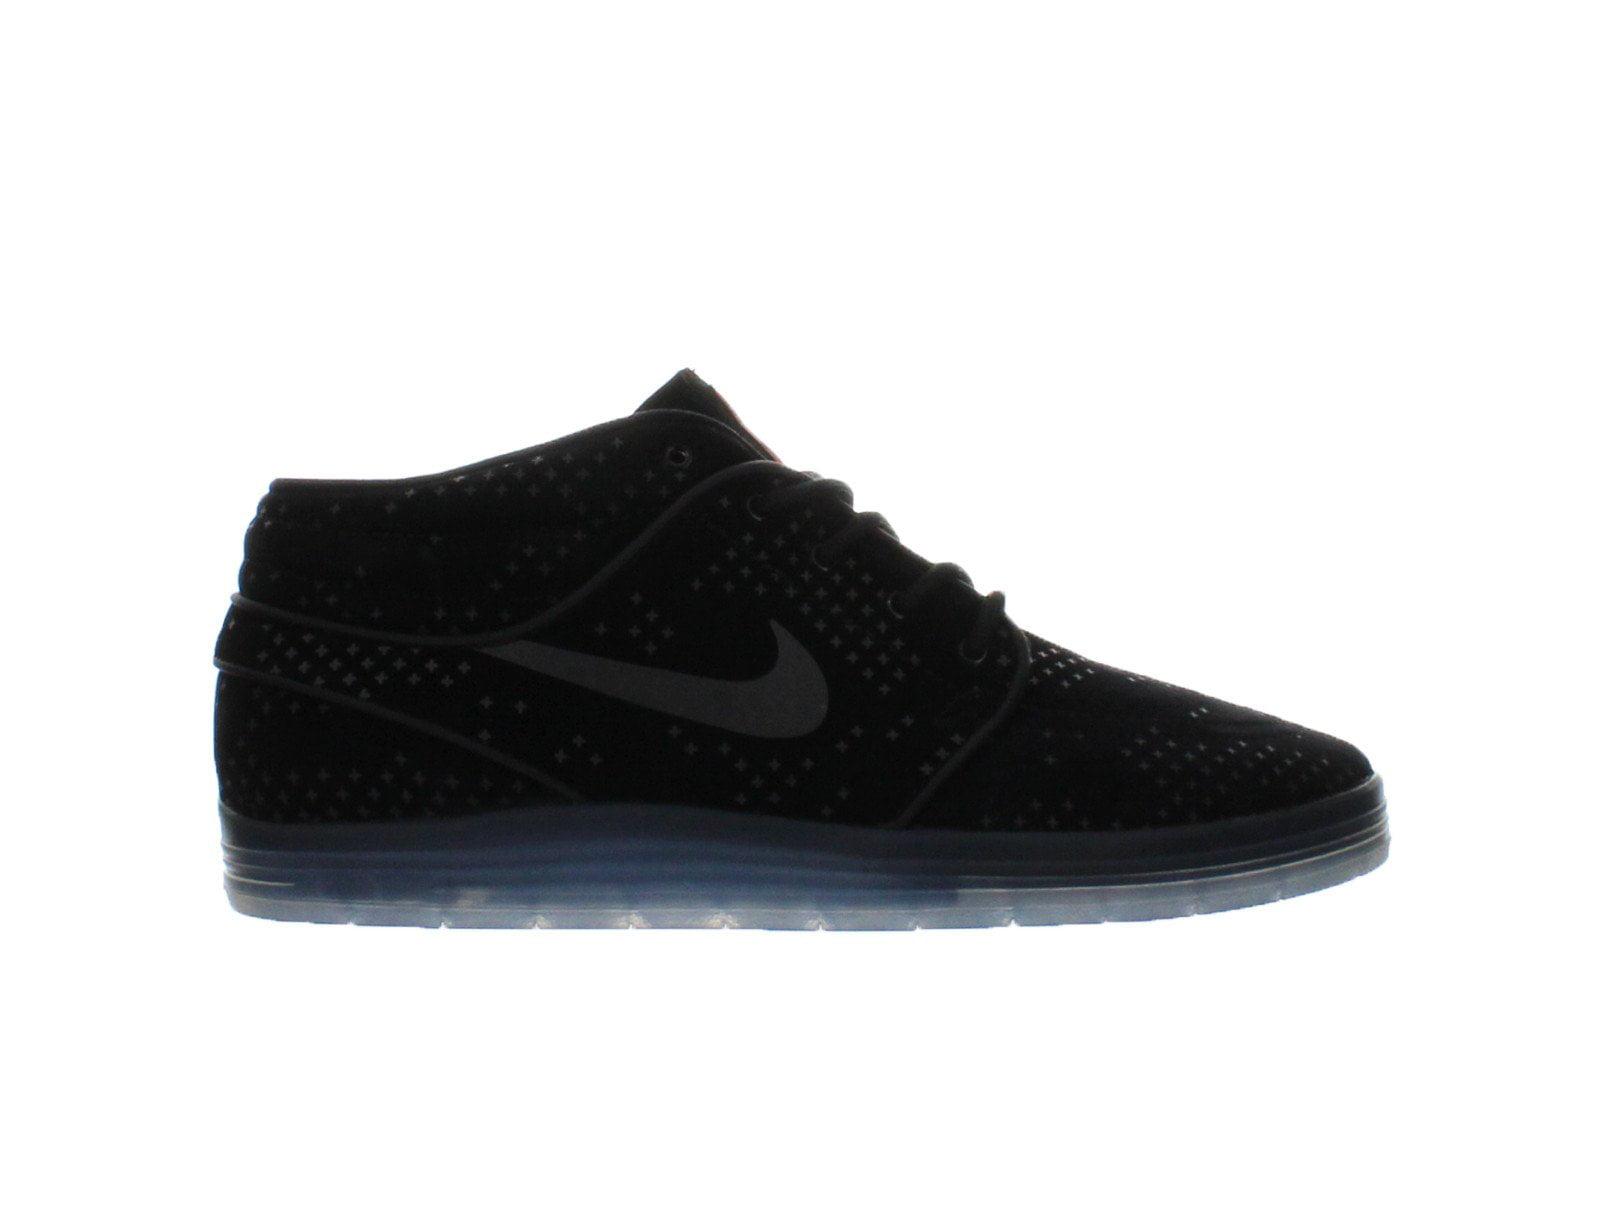 e7c03f9dc0c8 Nike - Mens Nike Lunar Stefan Janoski Mid Flash SB Black Clear ...